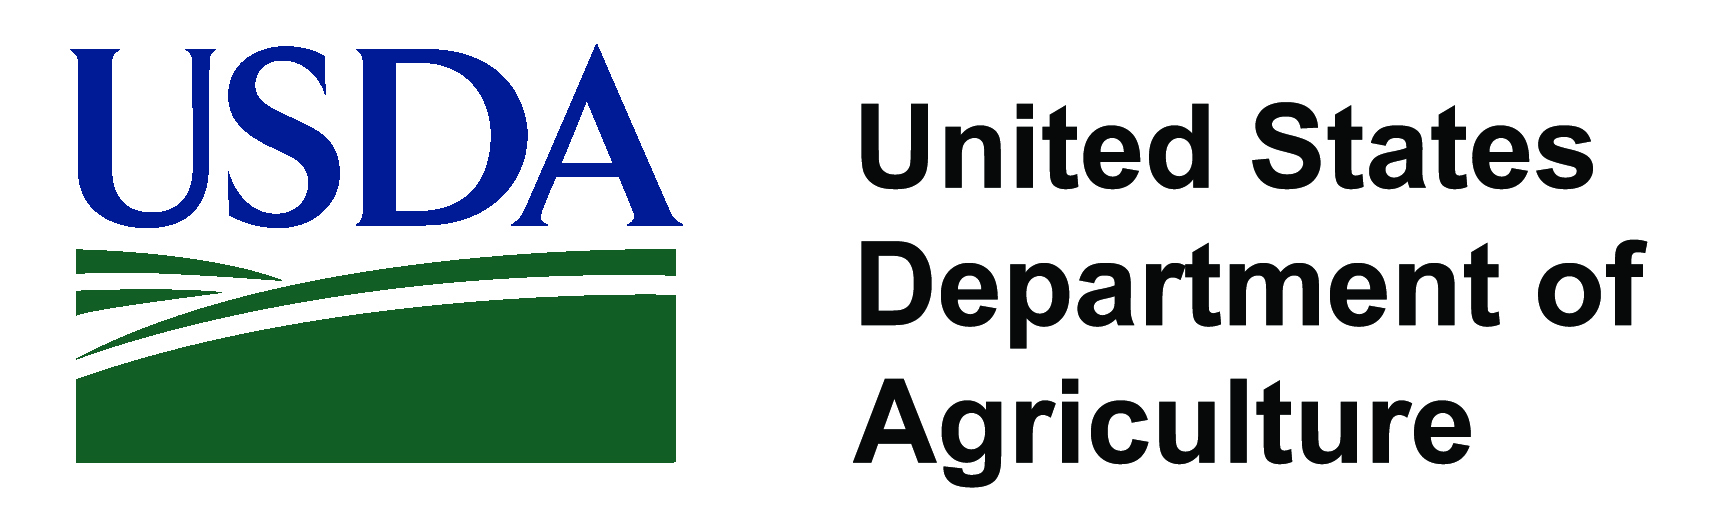 USDA COLOR Spelledout (3).jpg